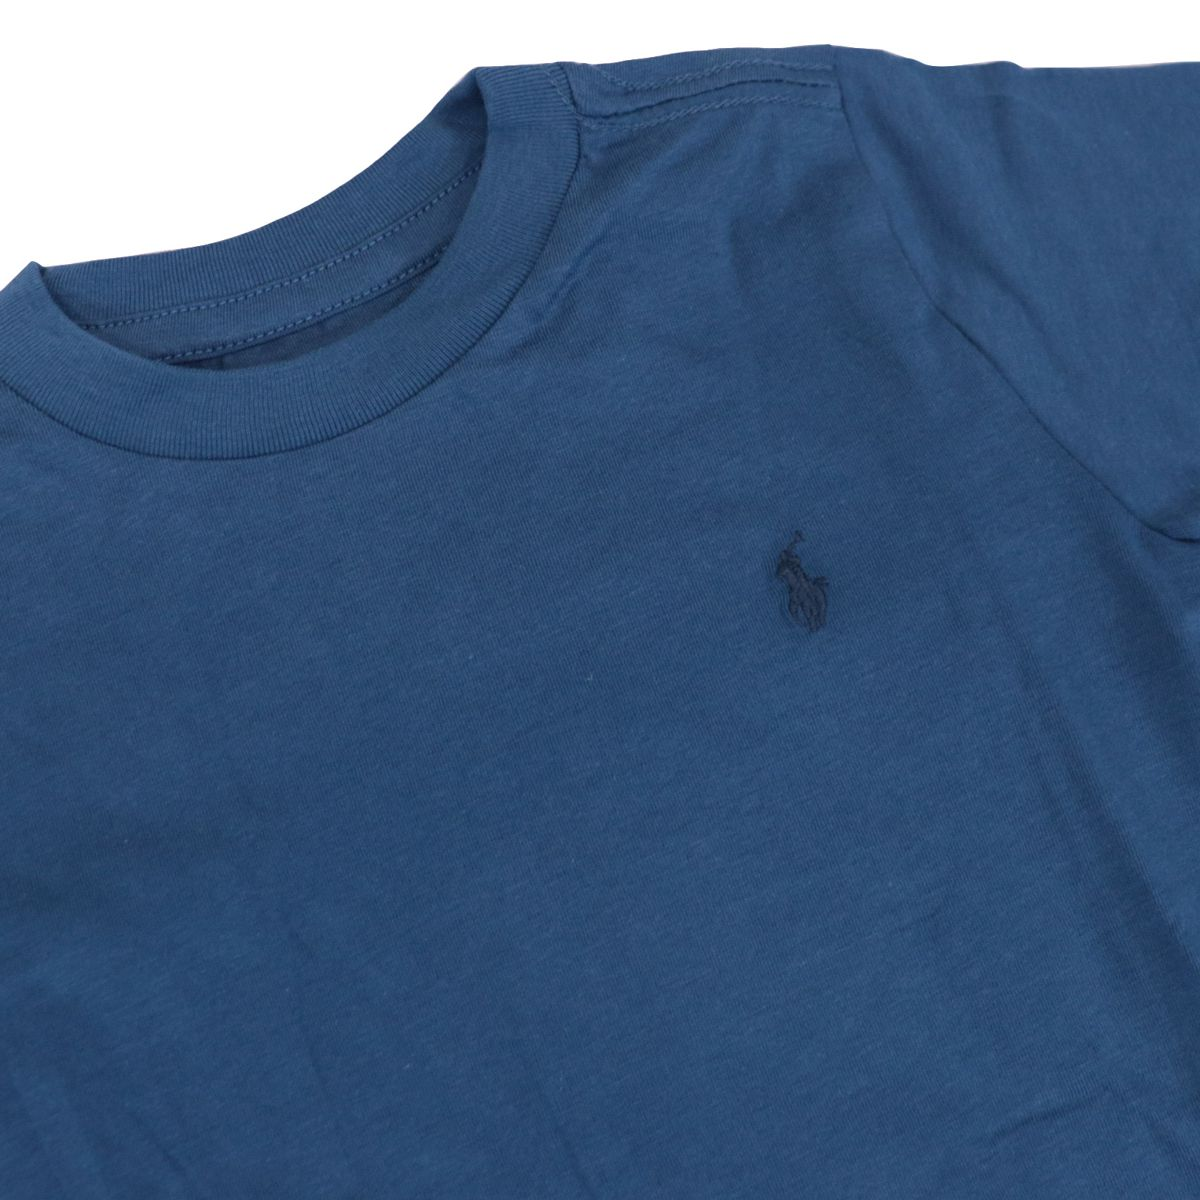 Basic cotton crew-neck t-shirt with logo Blue Polo Ralph Lauren